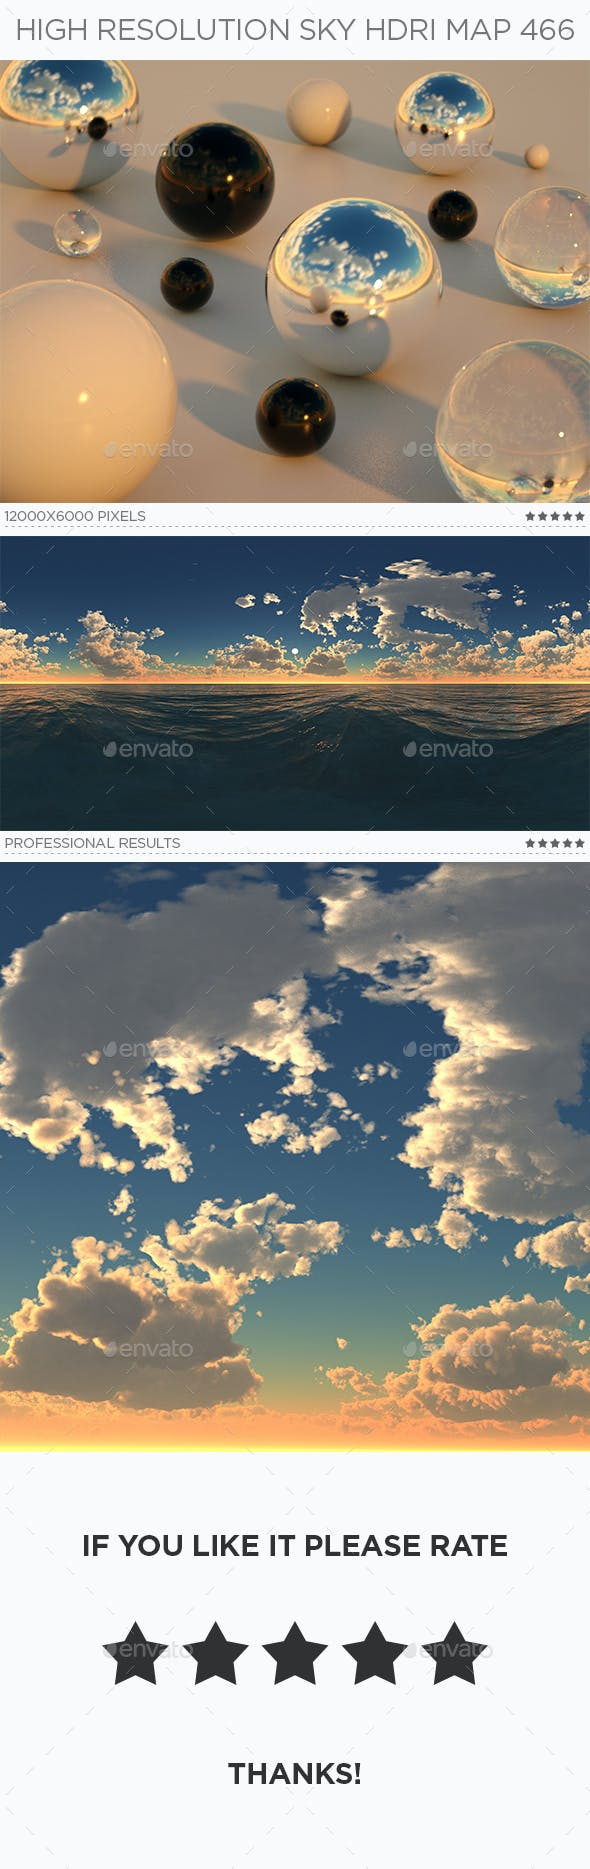 High Resolution Sky HDRi Map 466 - 3DOcean Item for Sale